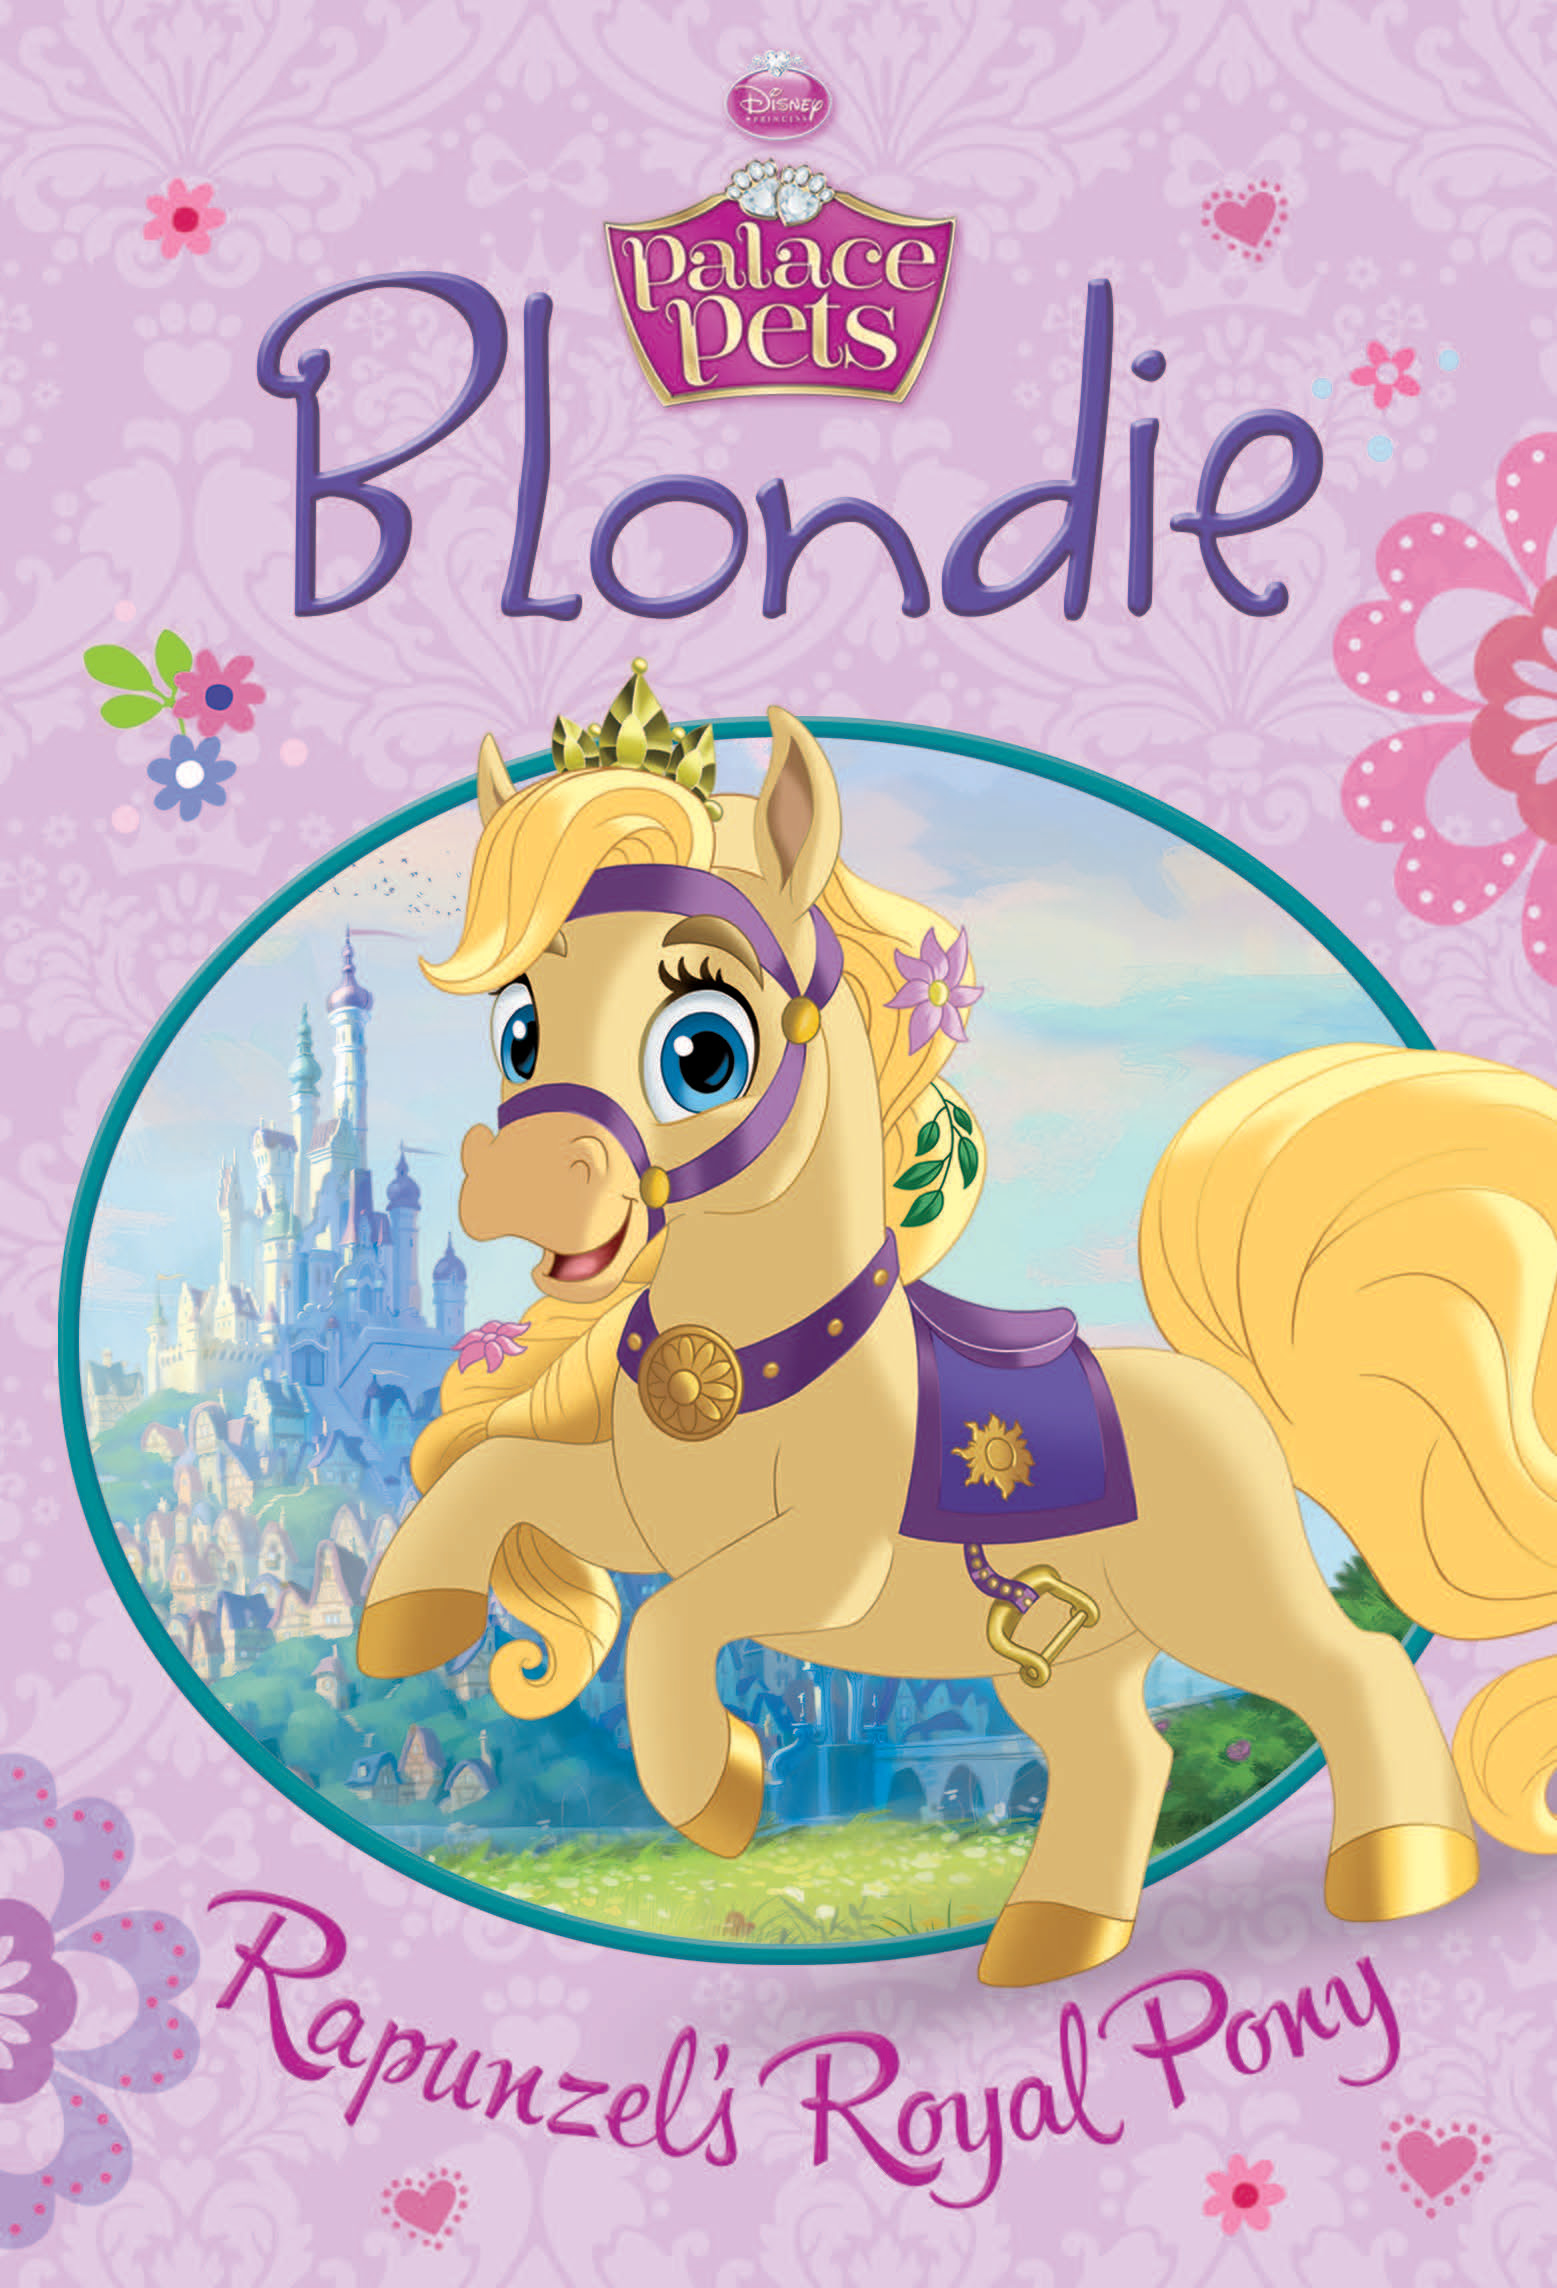 Palace Pets: Blondie | Disney Books | Disney Publishing ...